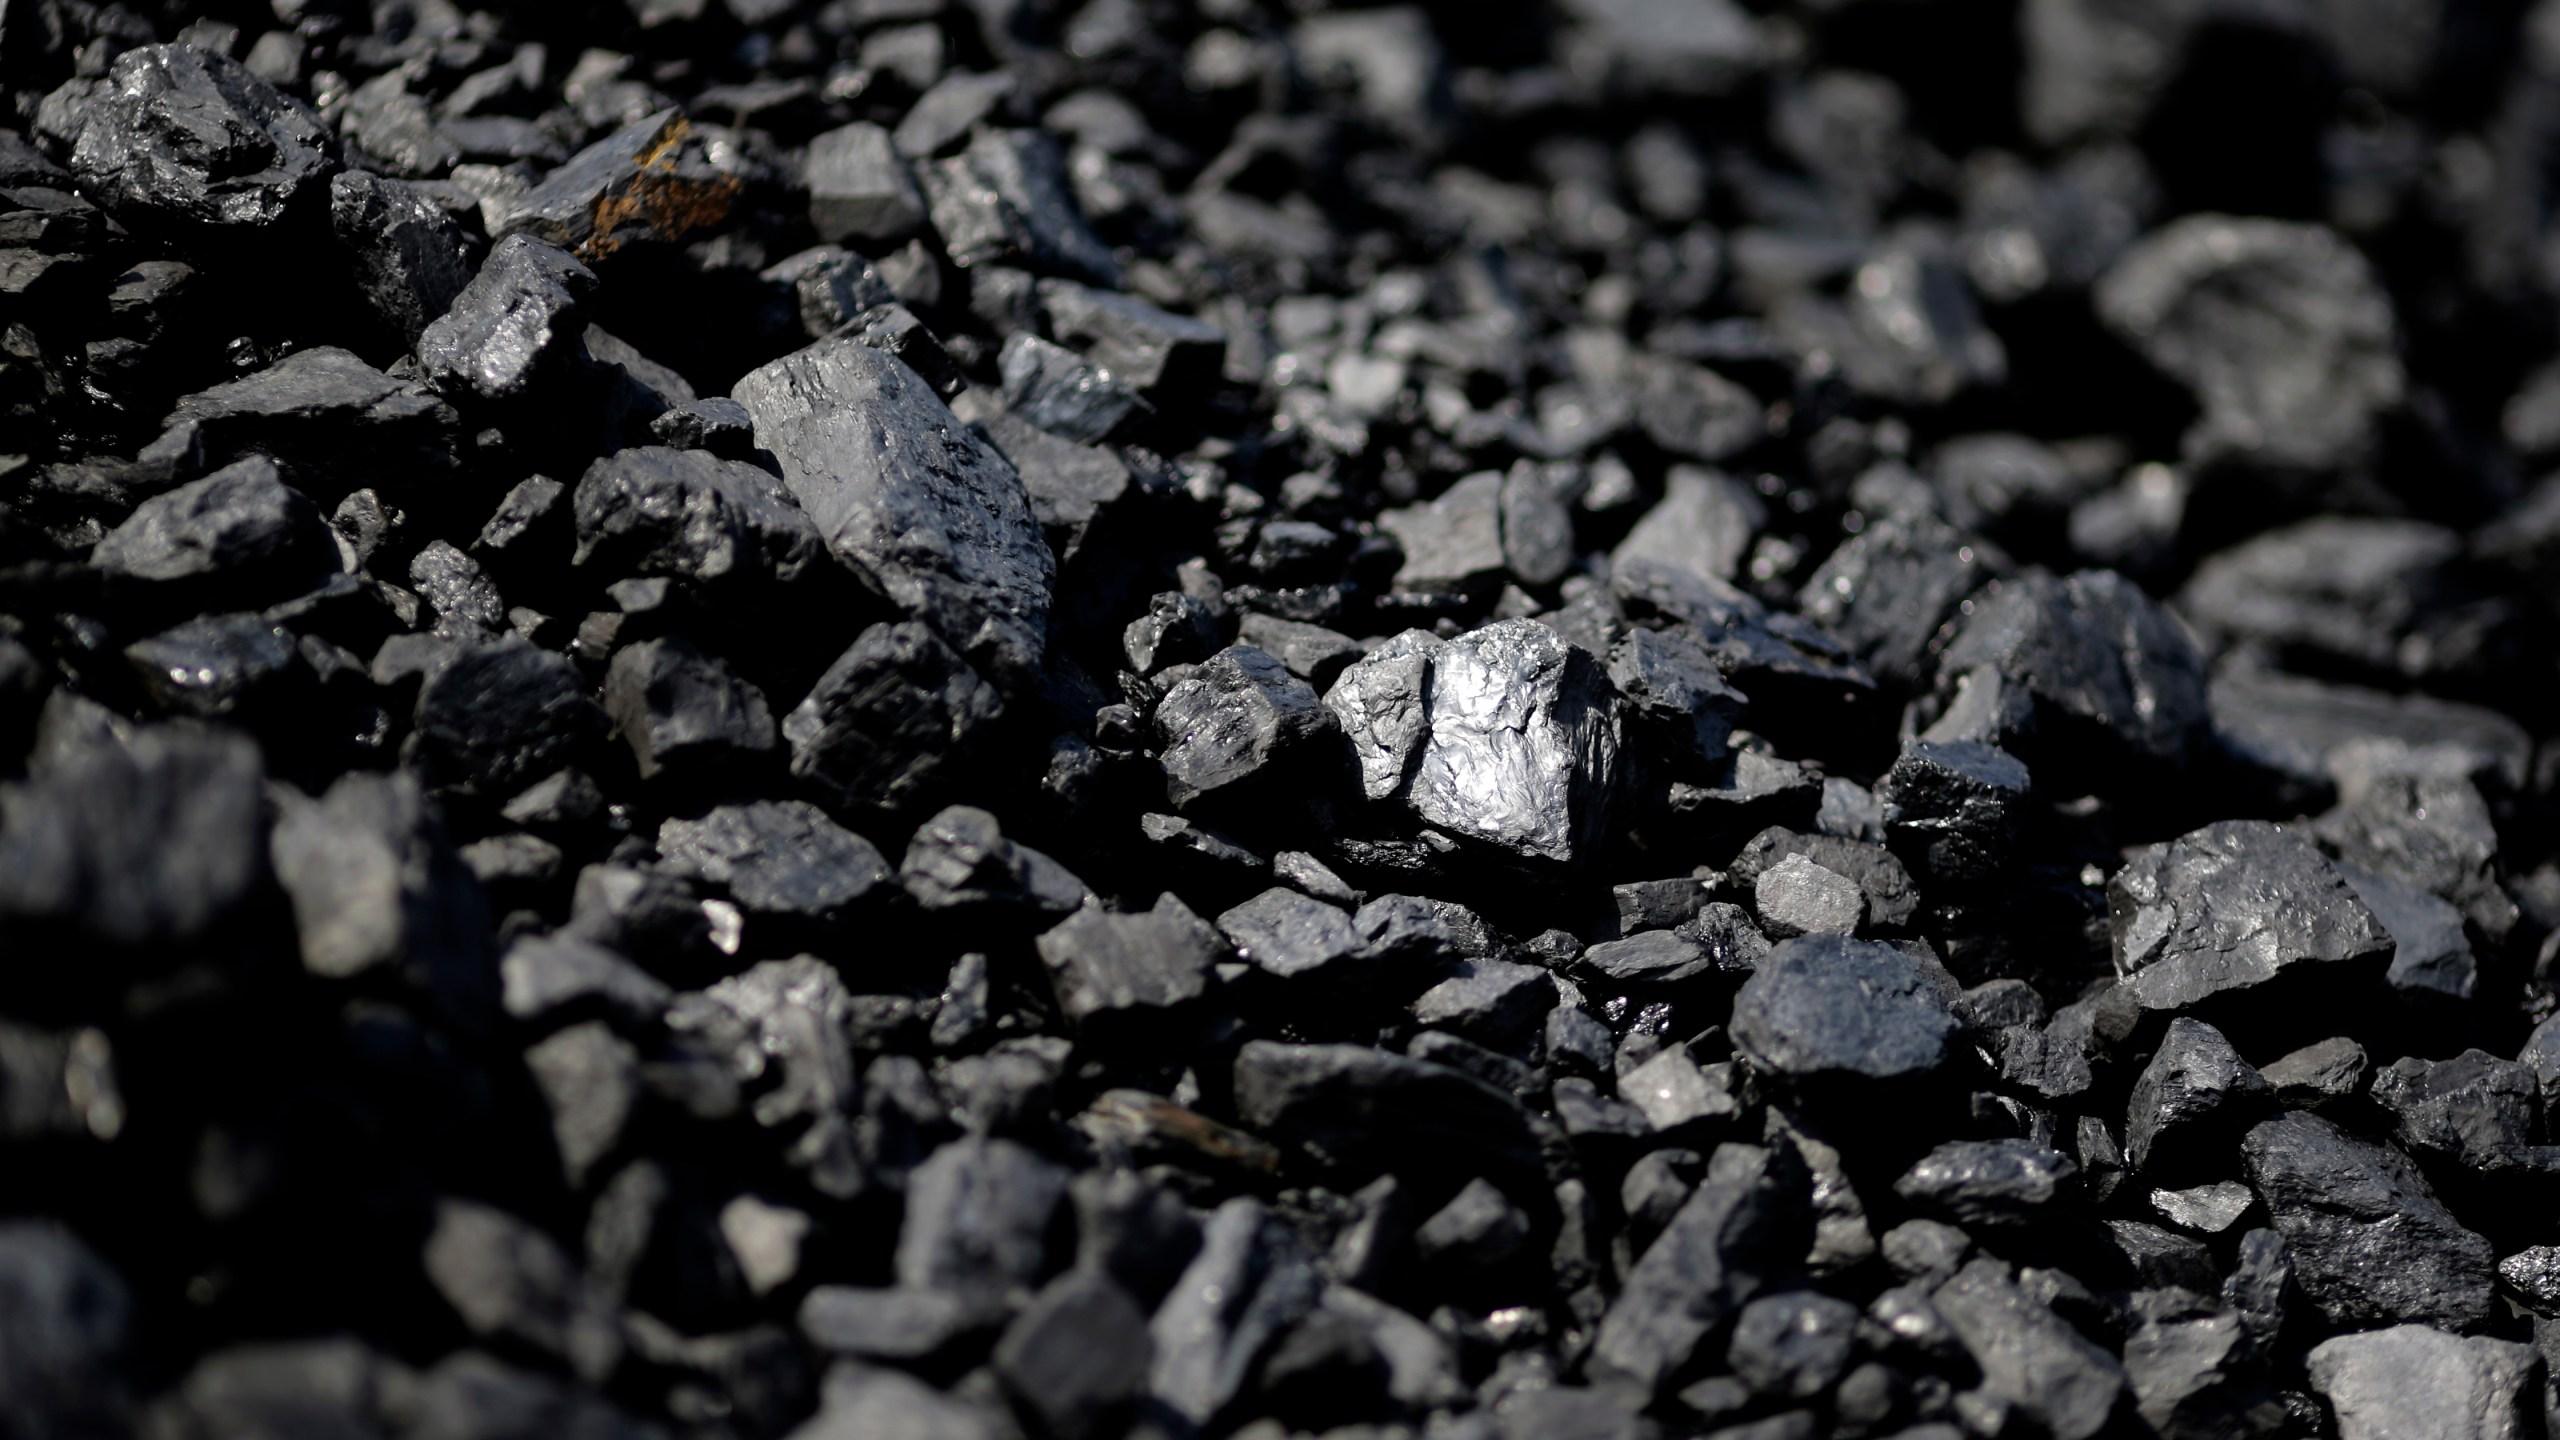 Coal_Exports_Military_Bases_76522-159532.jpg93192882